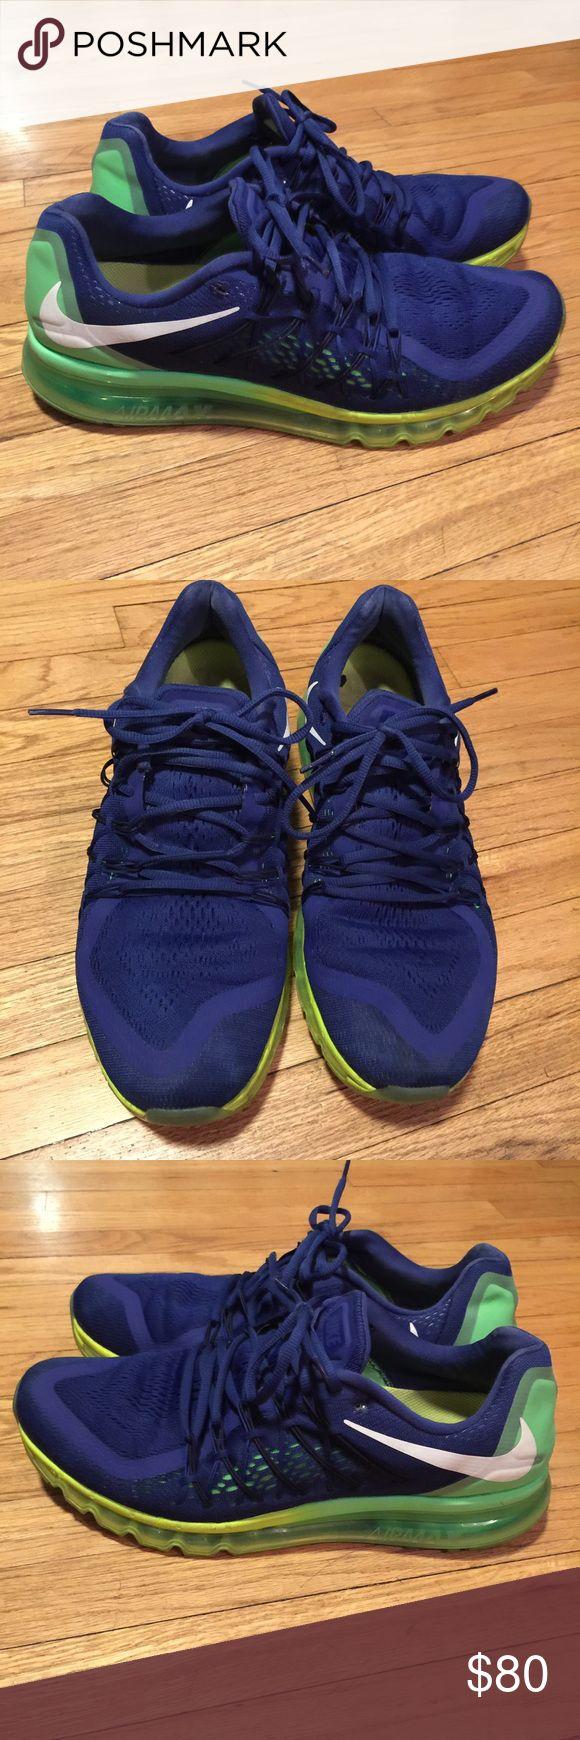 Mens Nike Air Max 2015 Royal Blue/Black - Size 13 Mens Nike Air Max 2015 Royal Blue/Black - Size 13. Used but great condition. Nike Shoes Sneakers